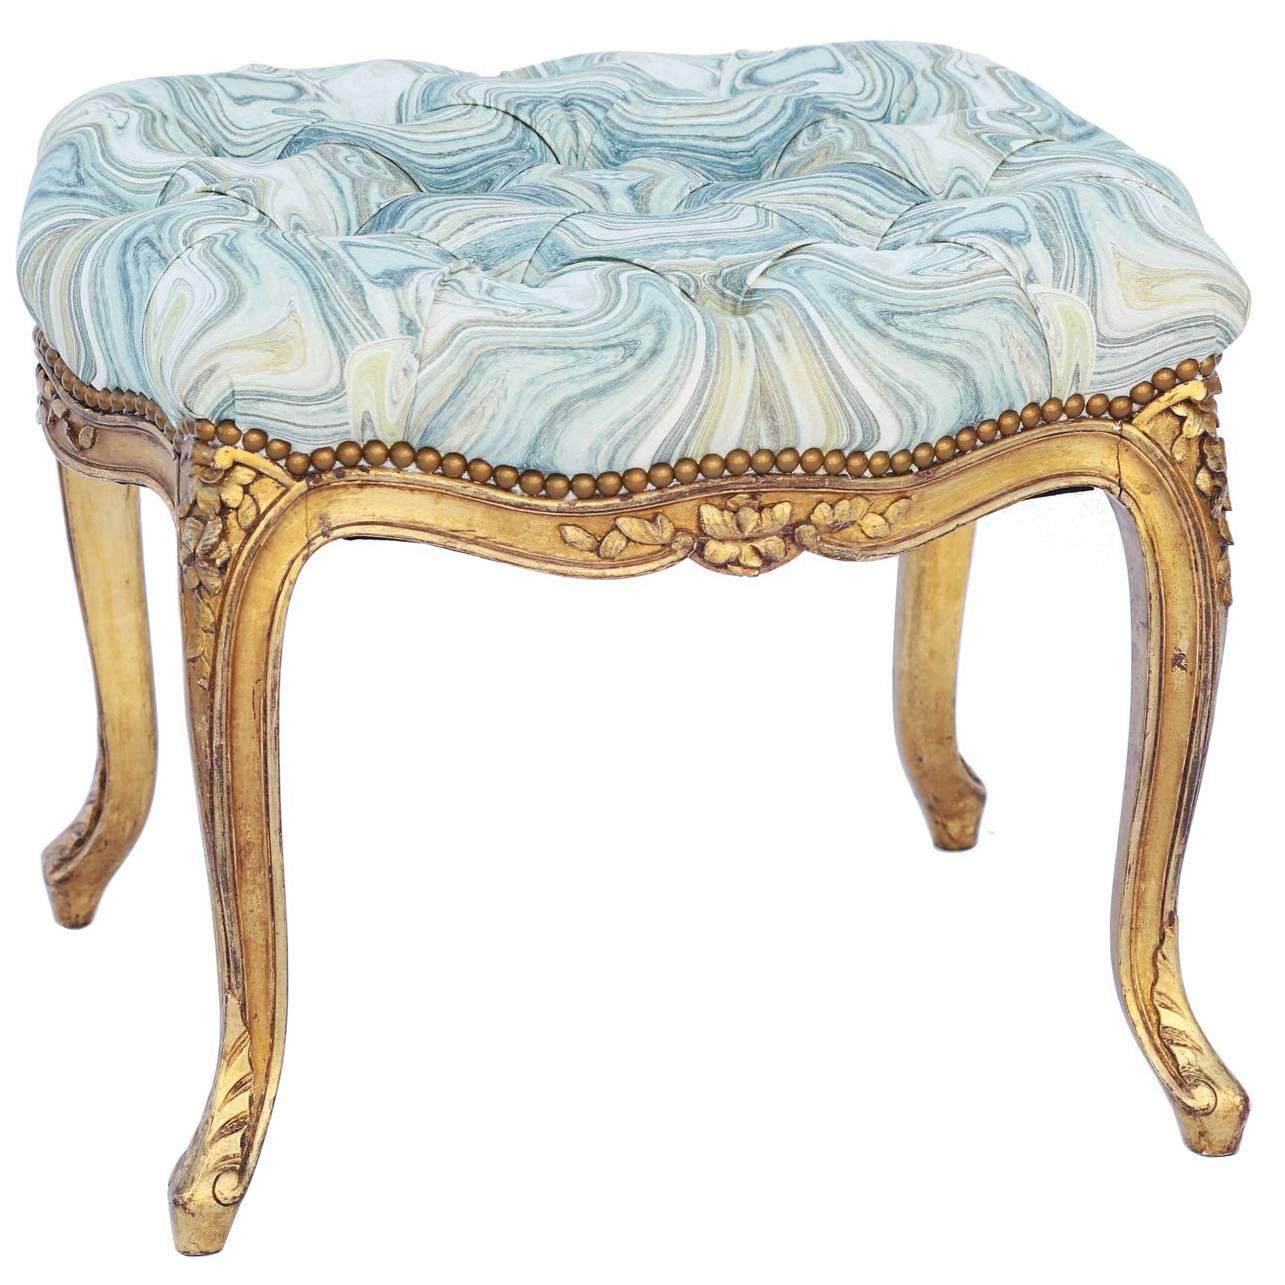 19th Century Louis XV Giltwood Bench